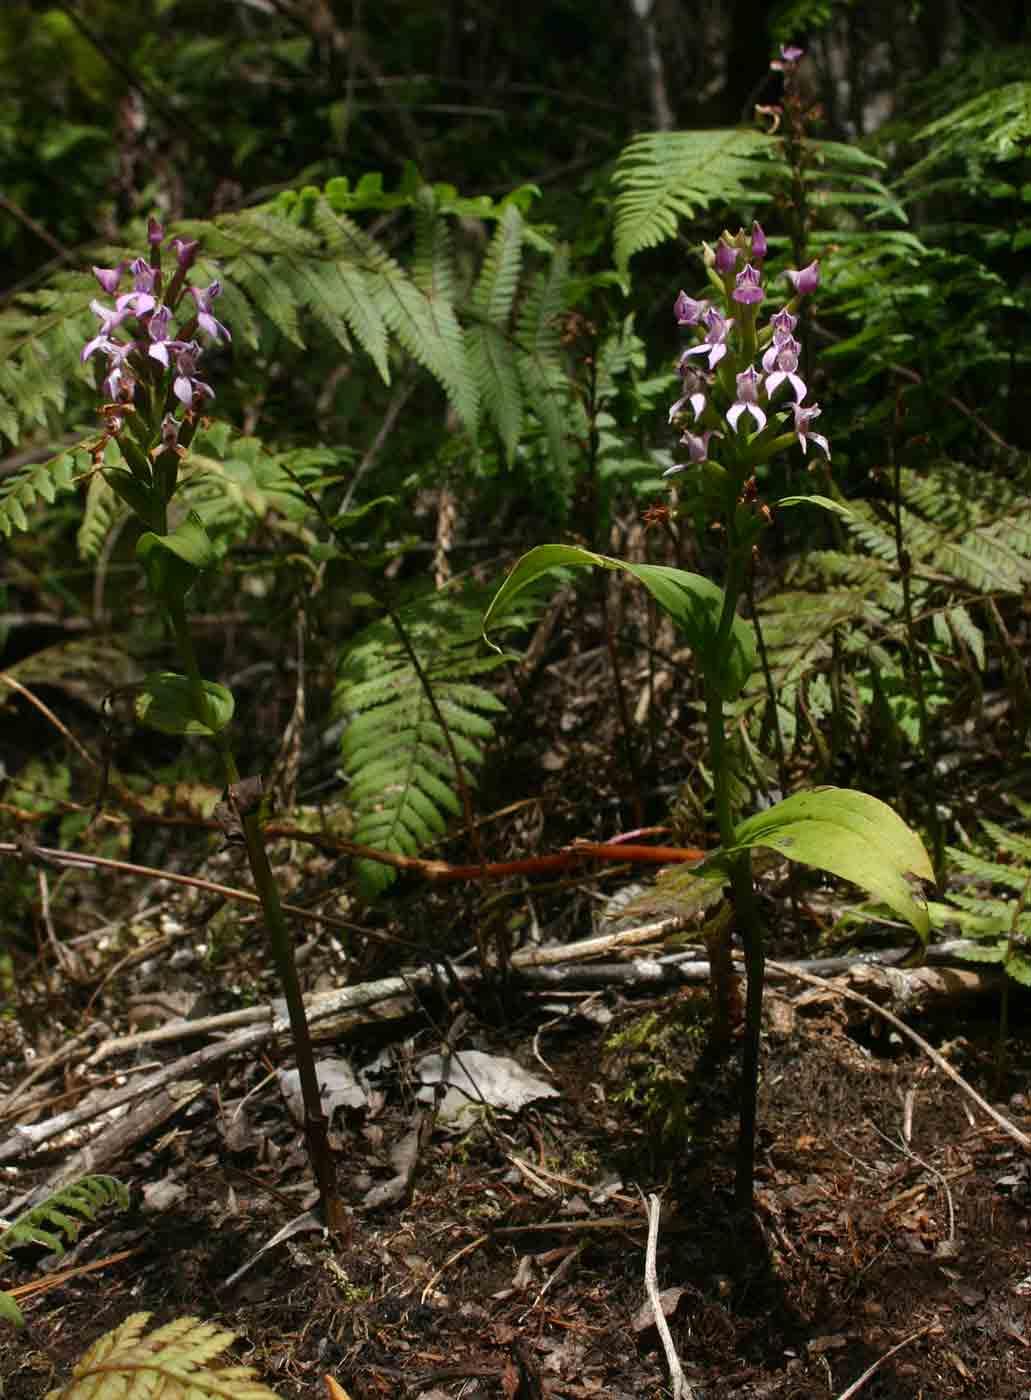 Brownleea maculata